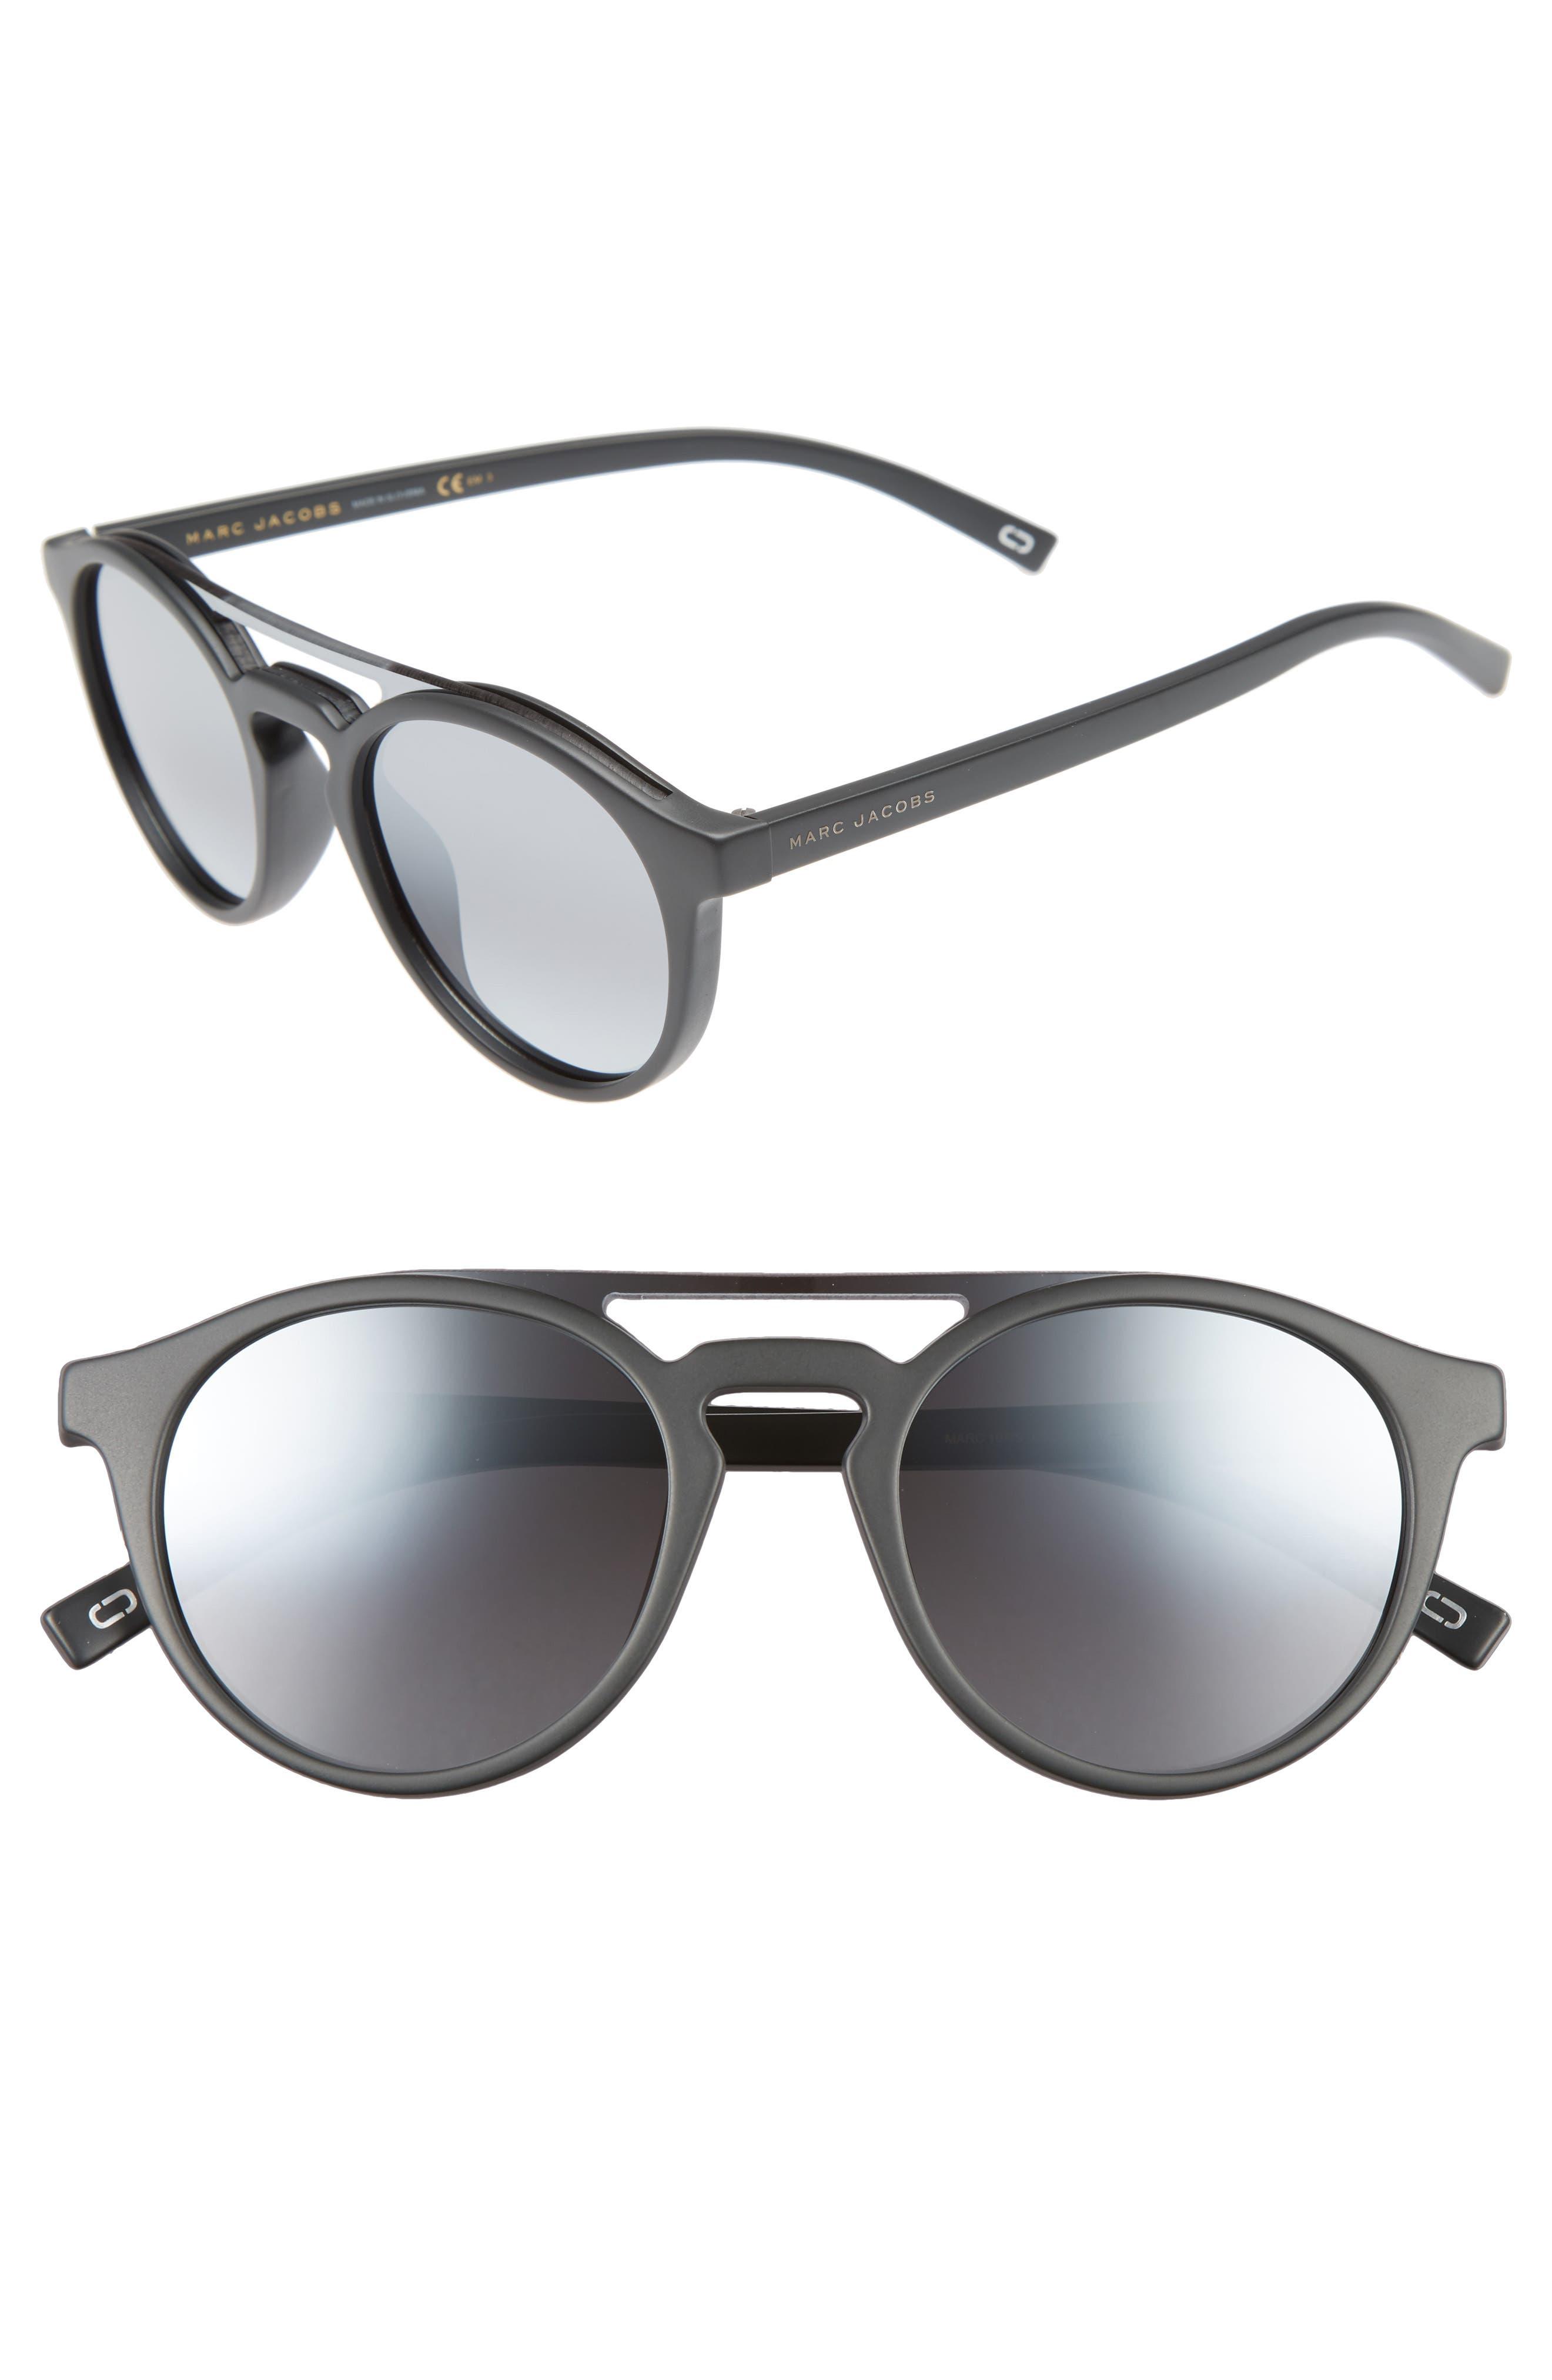 99mm Round Brow Bar Sunglasses,                             Alternate thumbnail 2, color,                             021